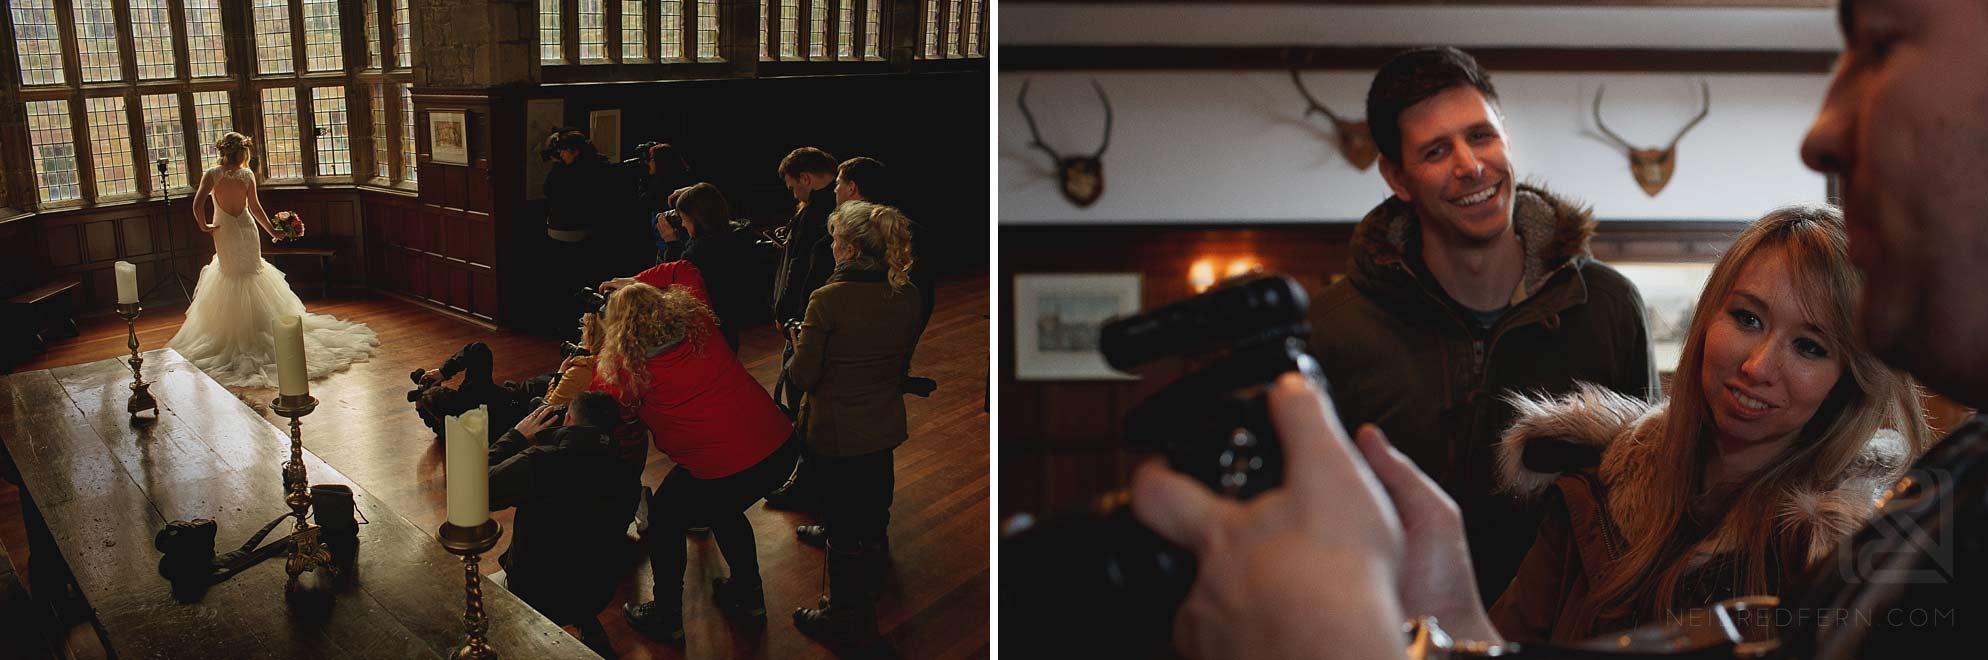 behind-the-scene-photograph-Neil-Redfern-workshop-03